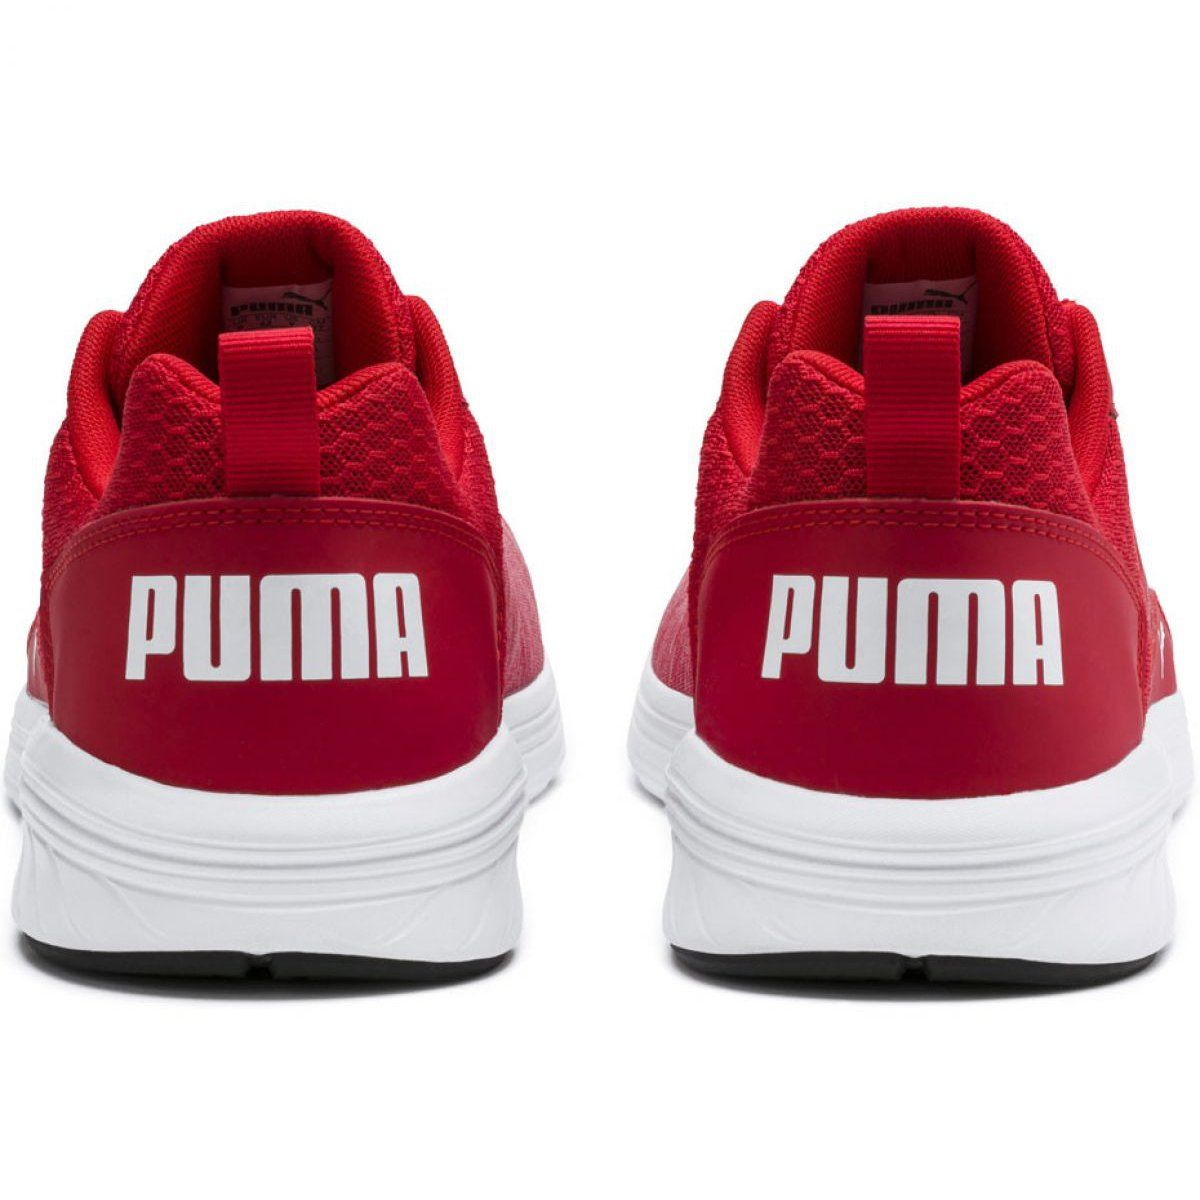 Buty Treningowe Puma Nrgy Comet M 190556 19 Czerwone Puma Baby Shoes Shoes